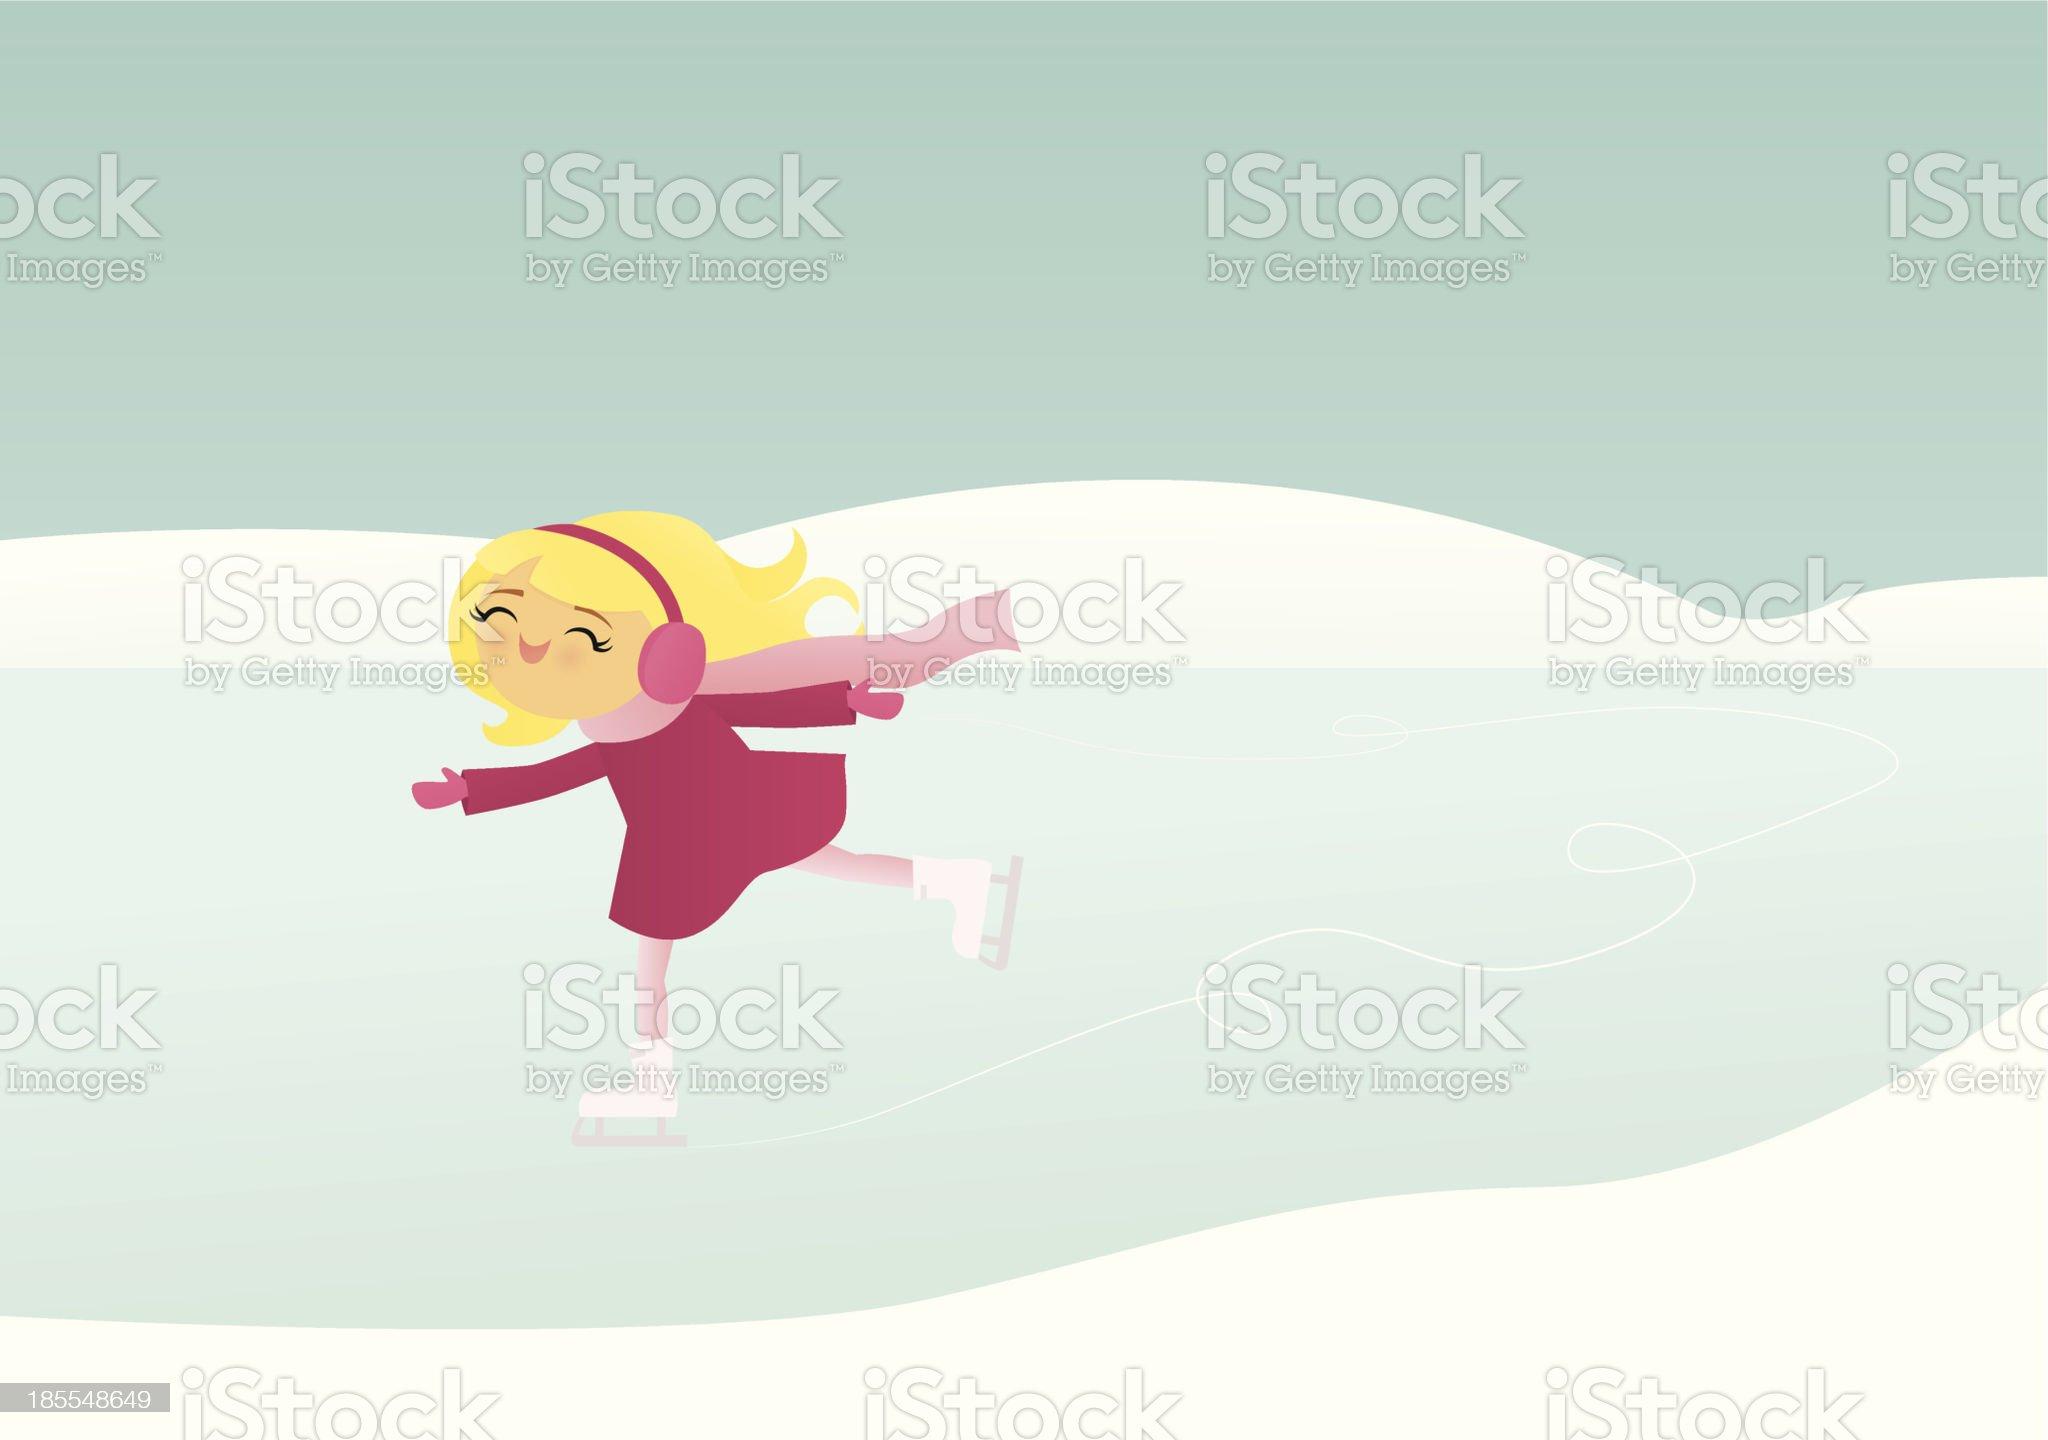 Ice Skating royalty-free stock vector art